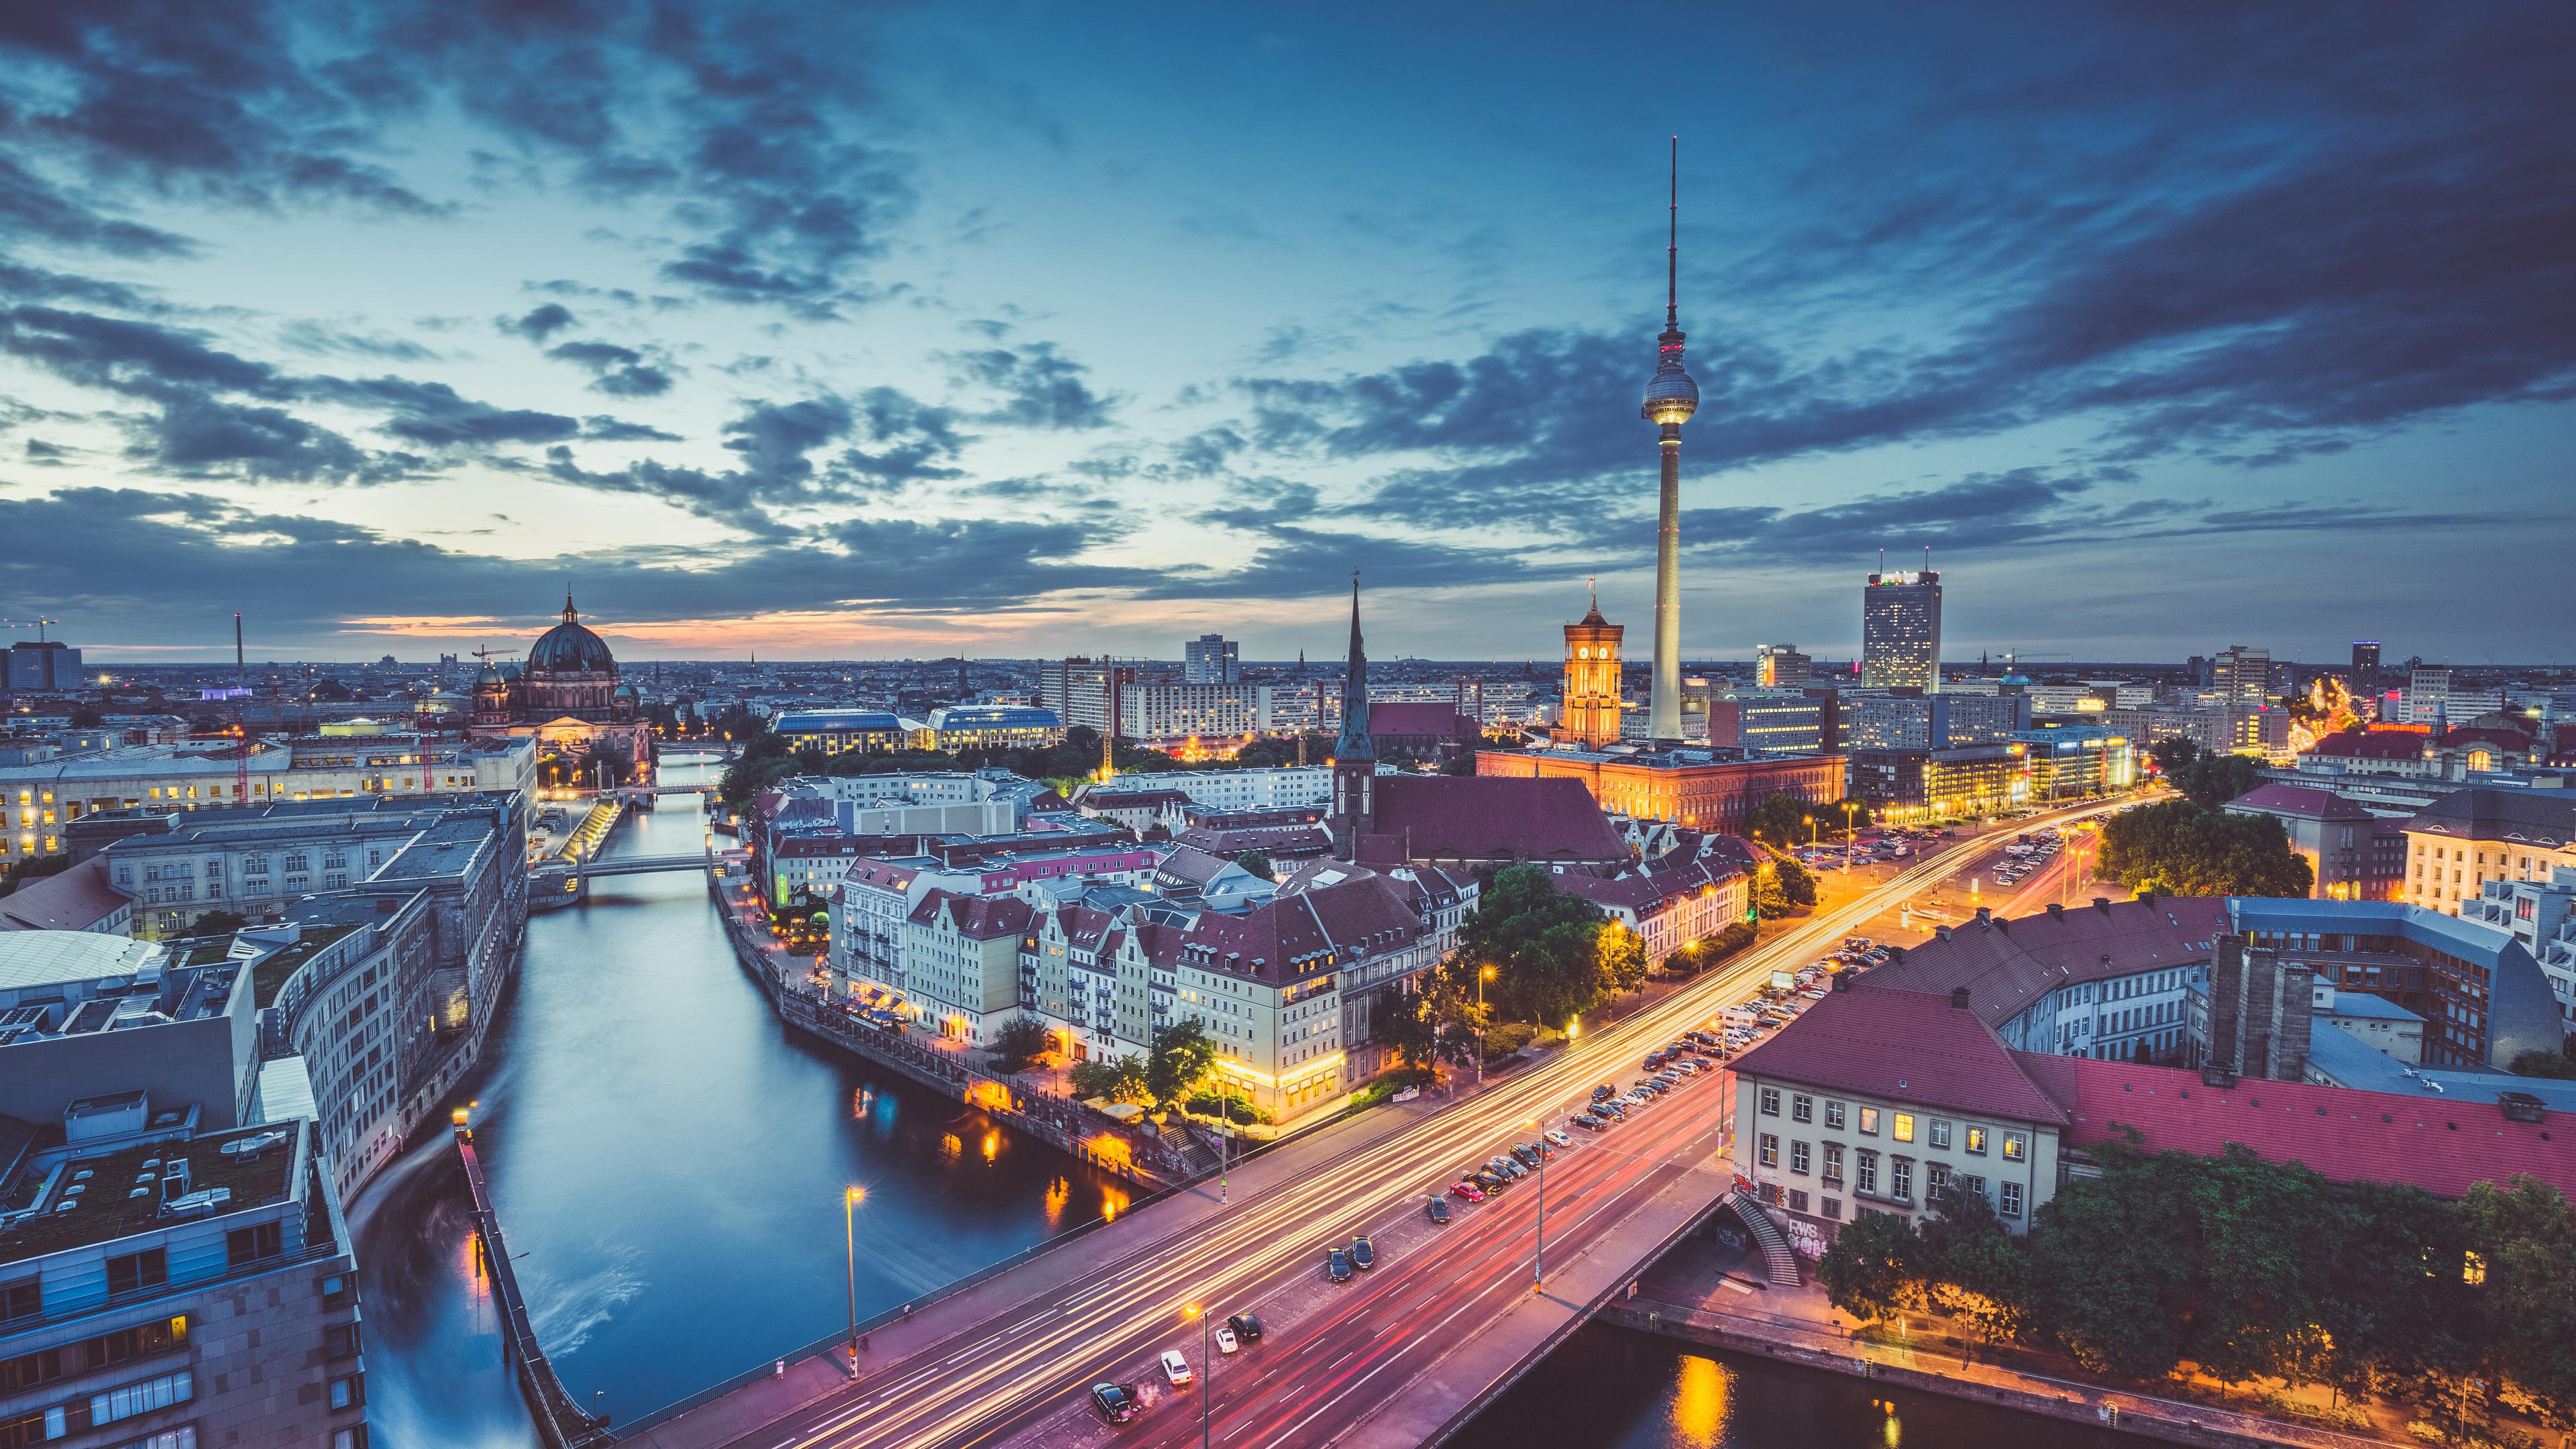 berlin capital of germany 4k 1547938086 - Berlin Capital Of Germany 4k - world wallpapers, photography wallpapers, hd-wallpapers, germany wallpapers, city wallpapers, buildings wallpapers, 5k wallpapers, 4k-wallpapers